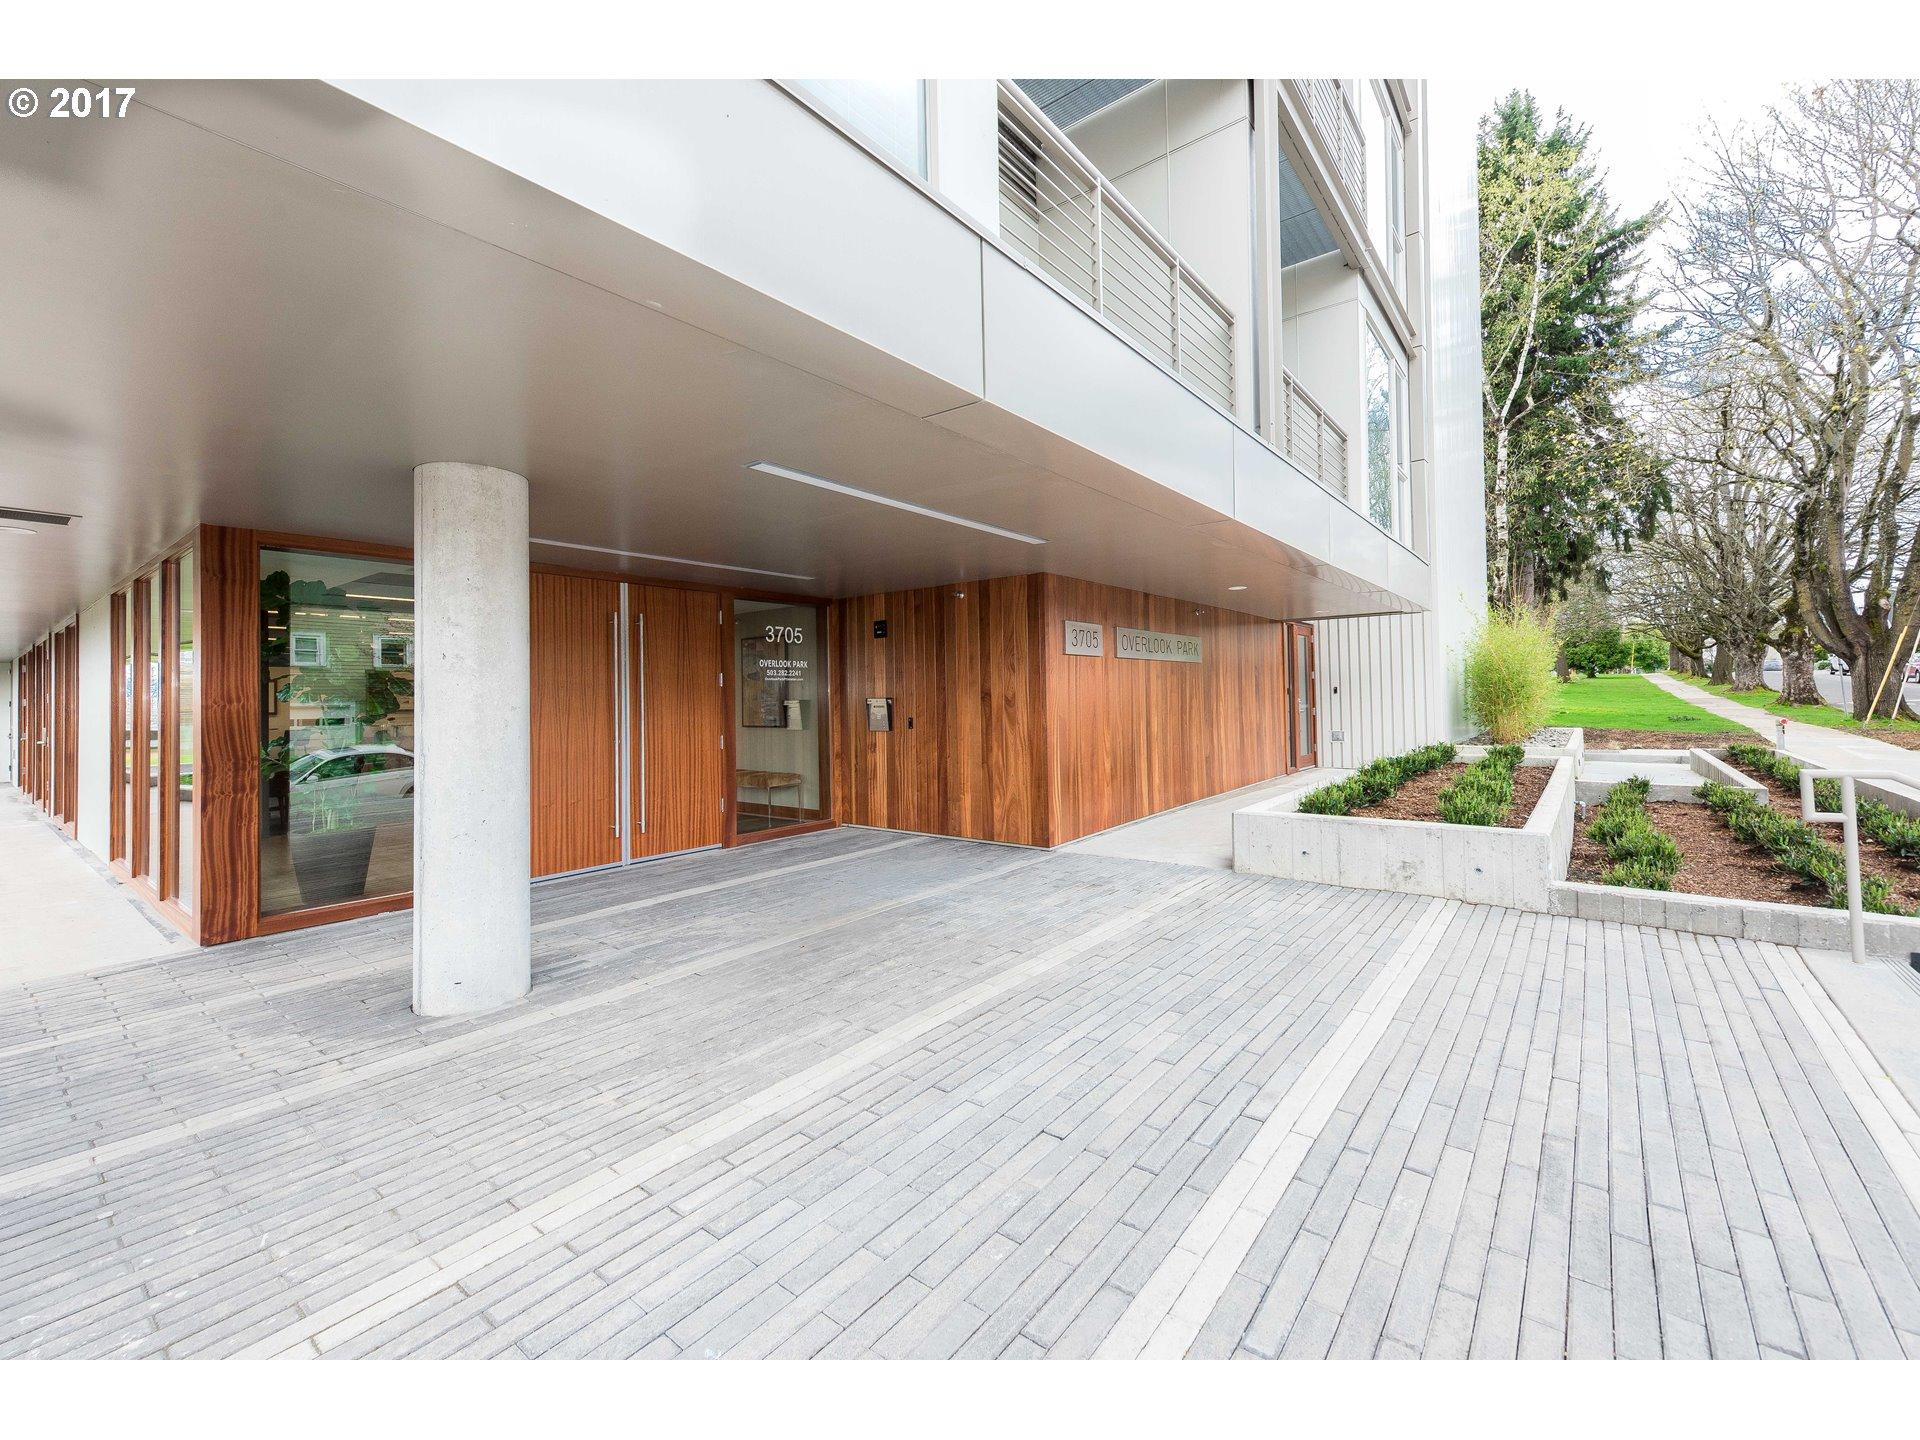 3705 N Overlook BLVD 210, Portland, OR 97227